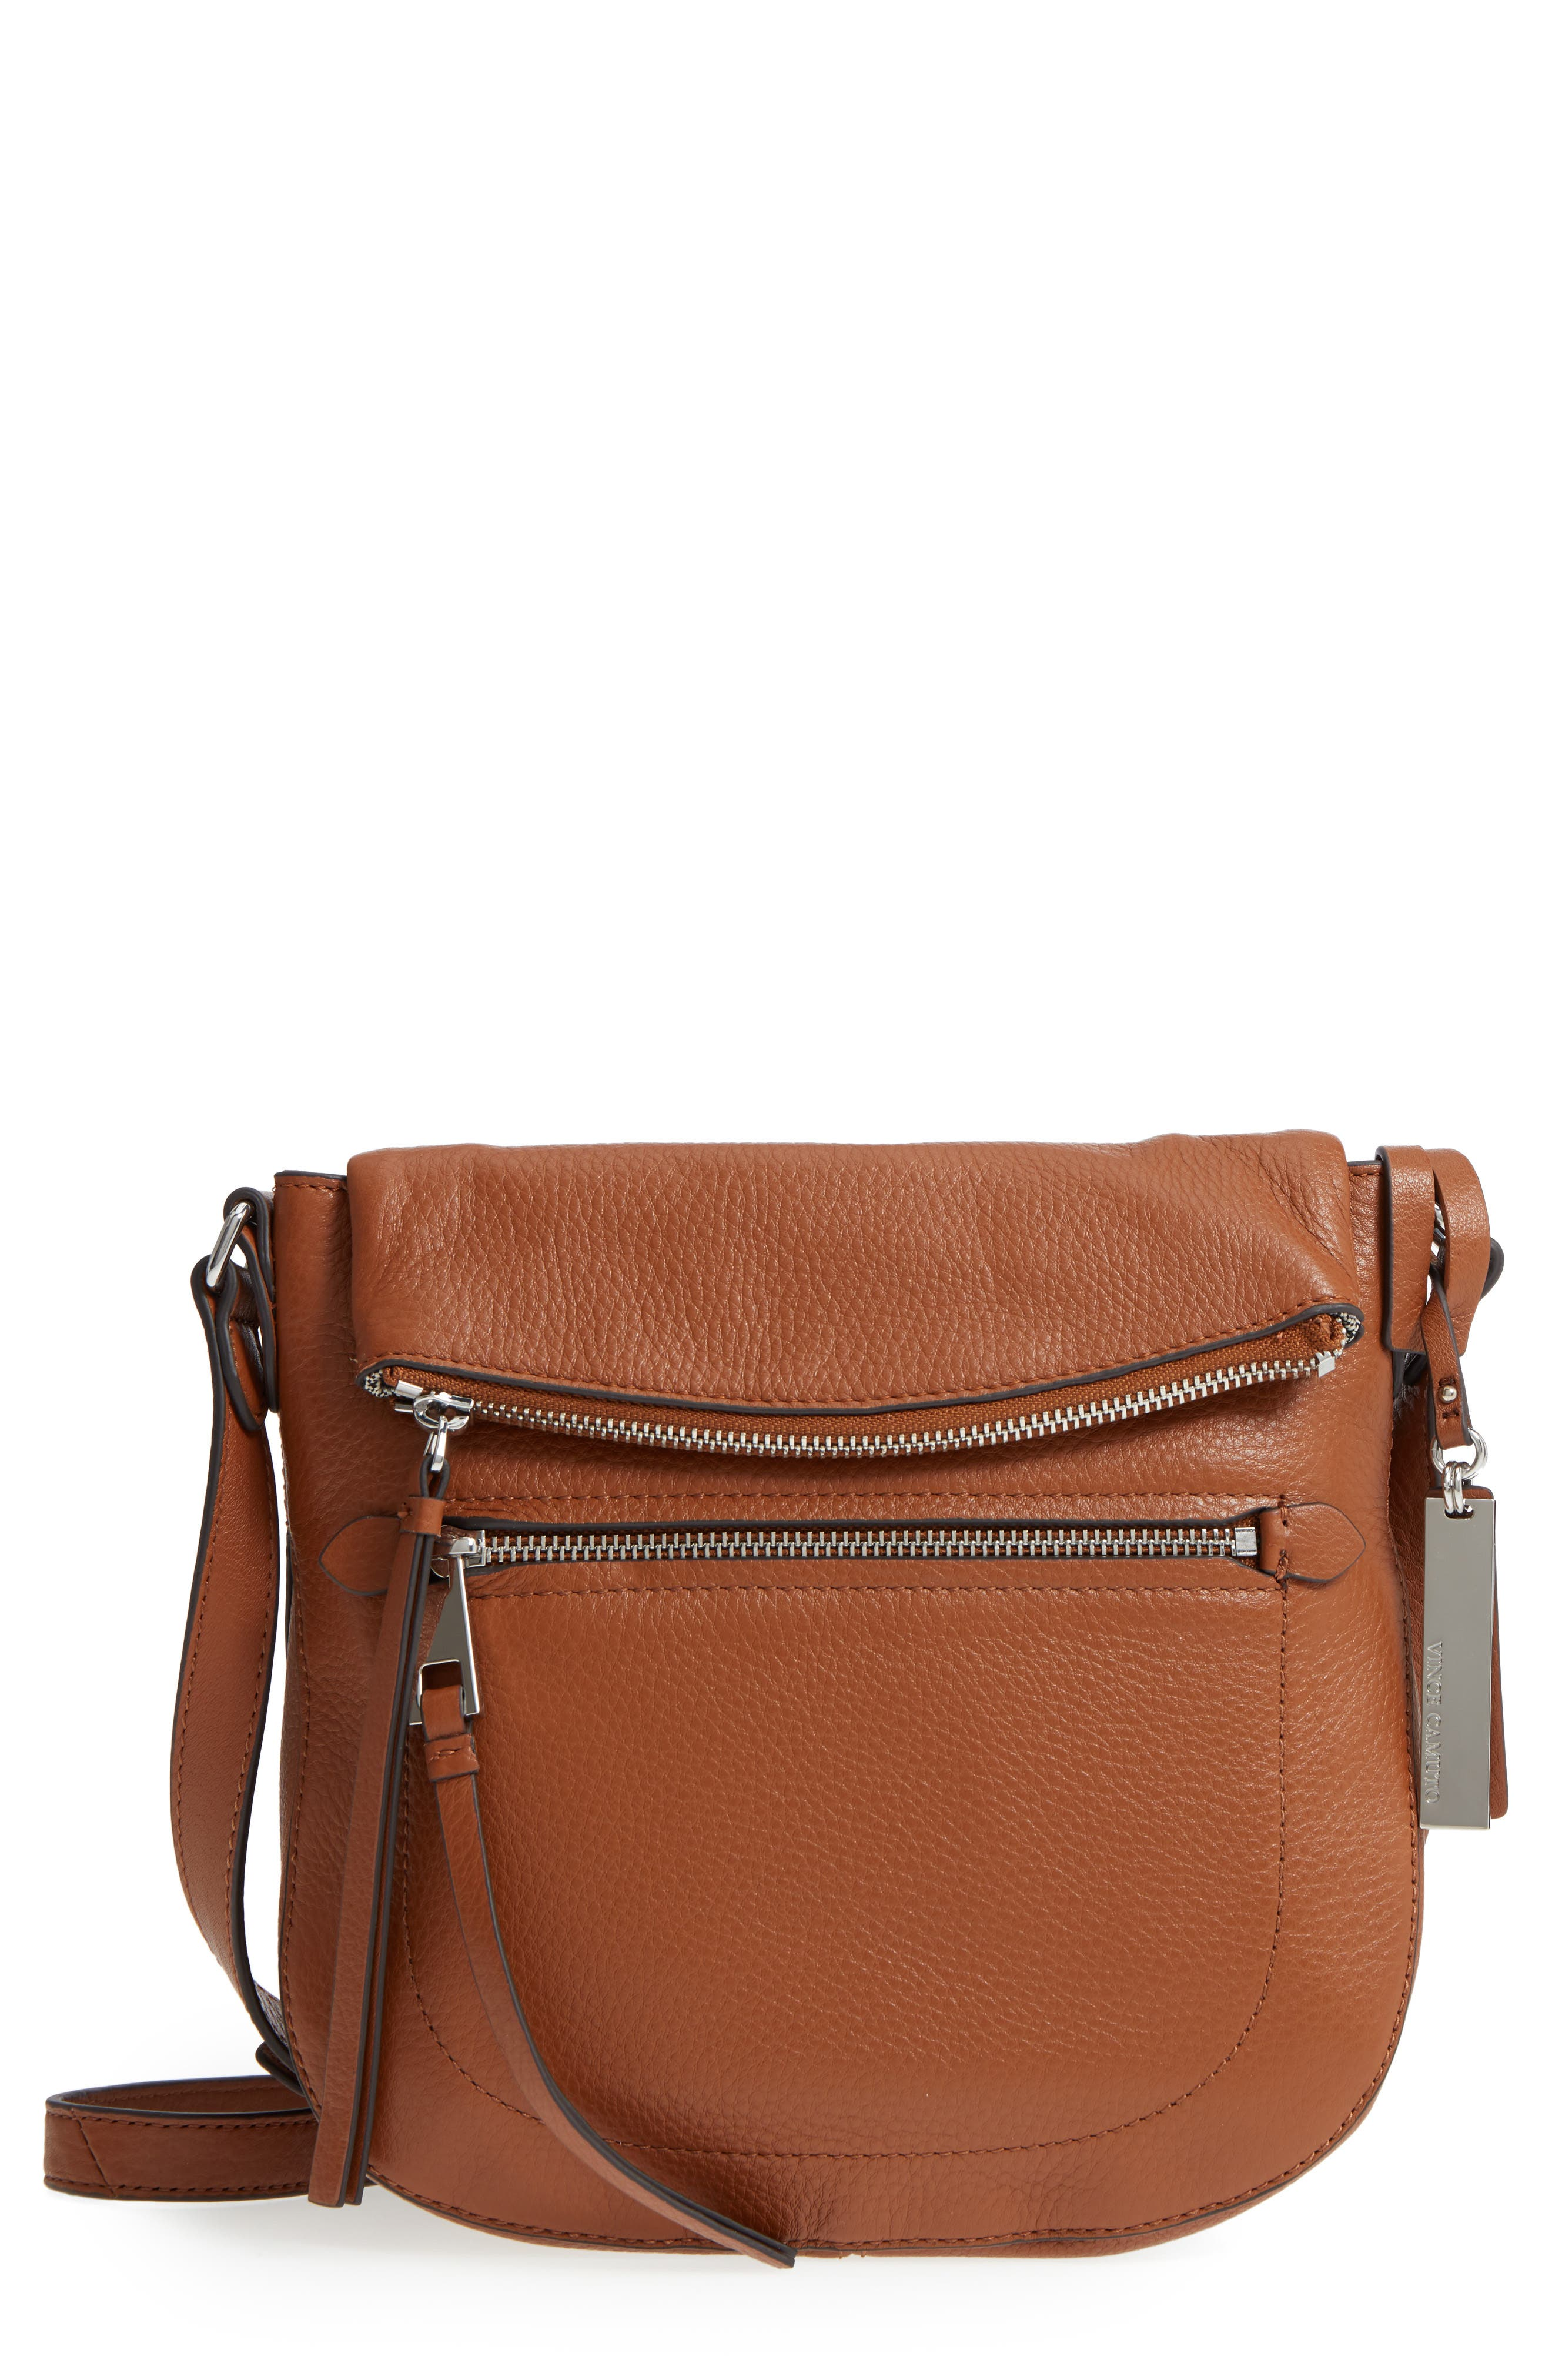 'Tala' Leather Crossbody Bag,                             Main thumbnail 1, color,                             203